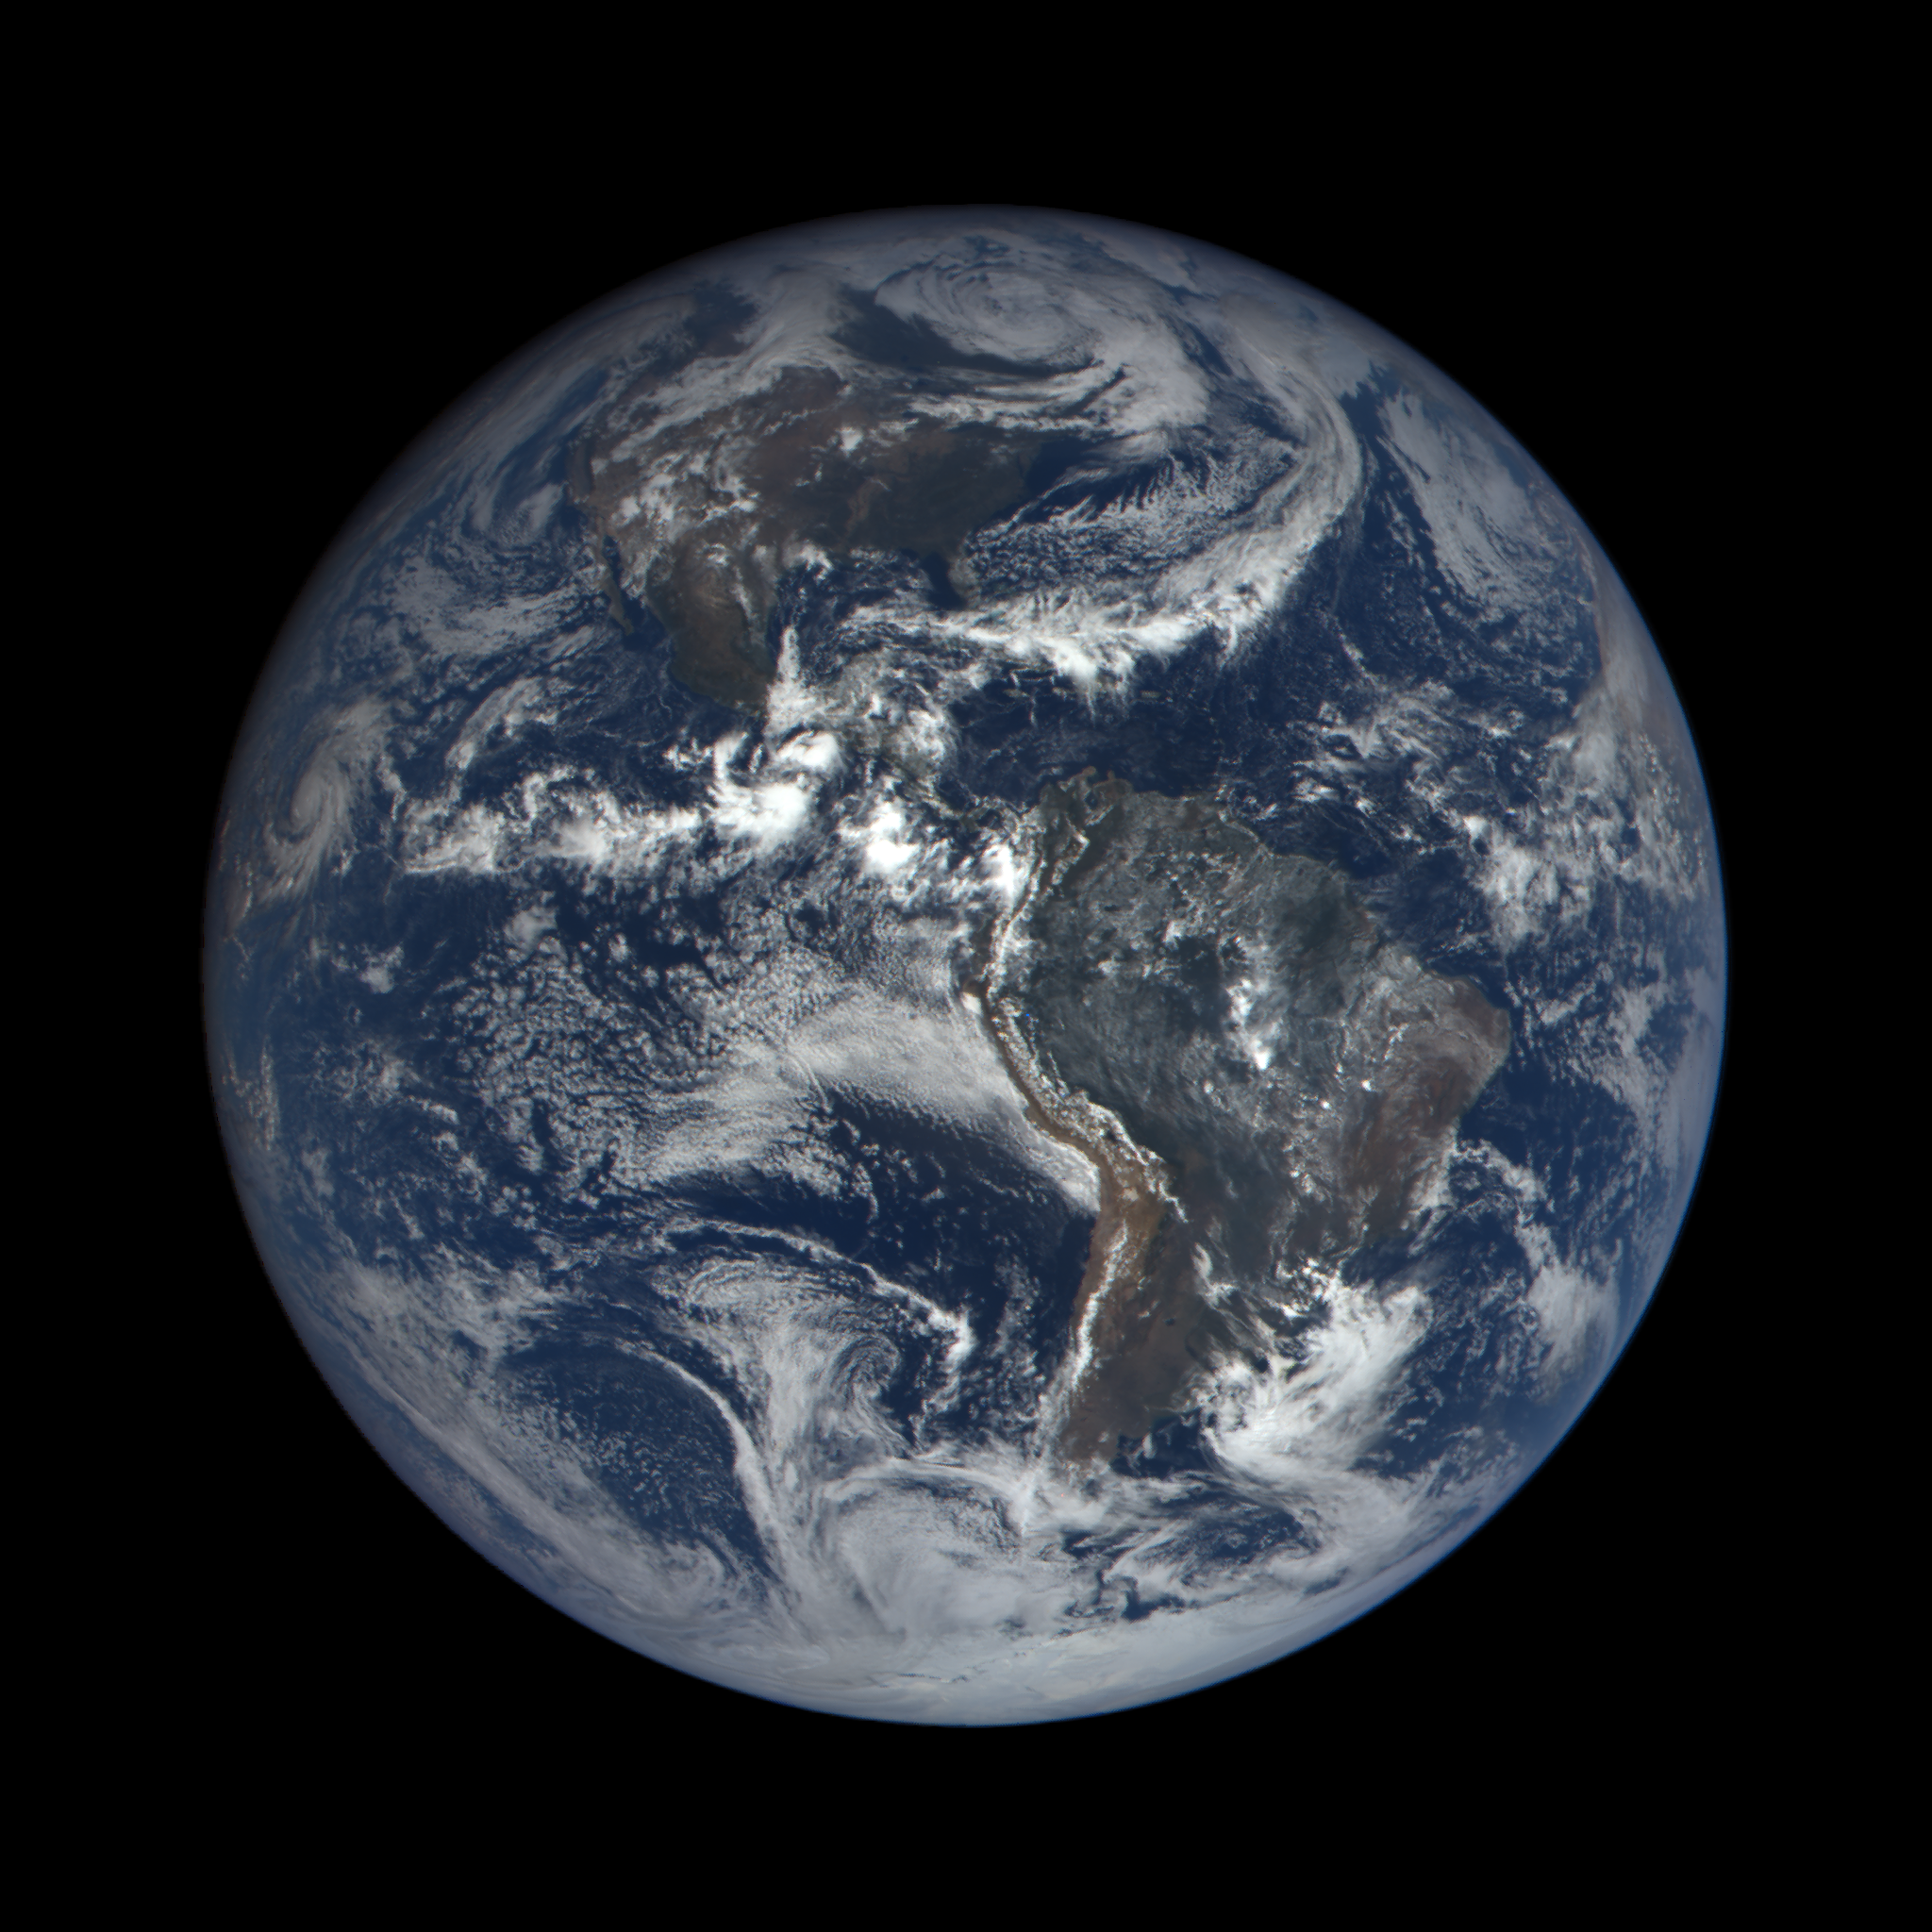 10-21-15 NASA EPIC